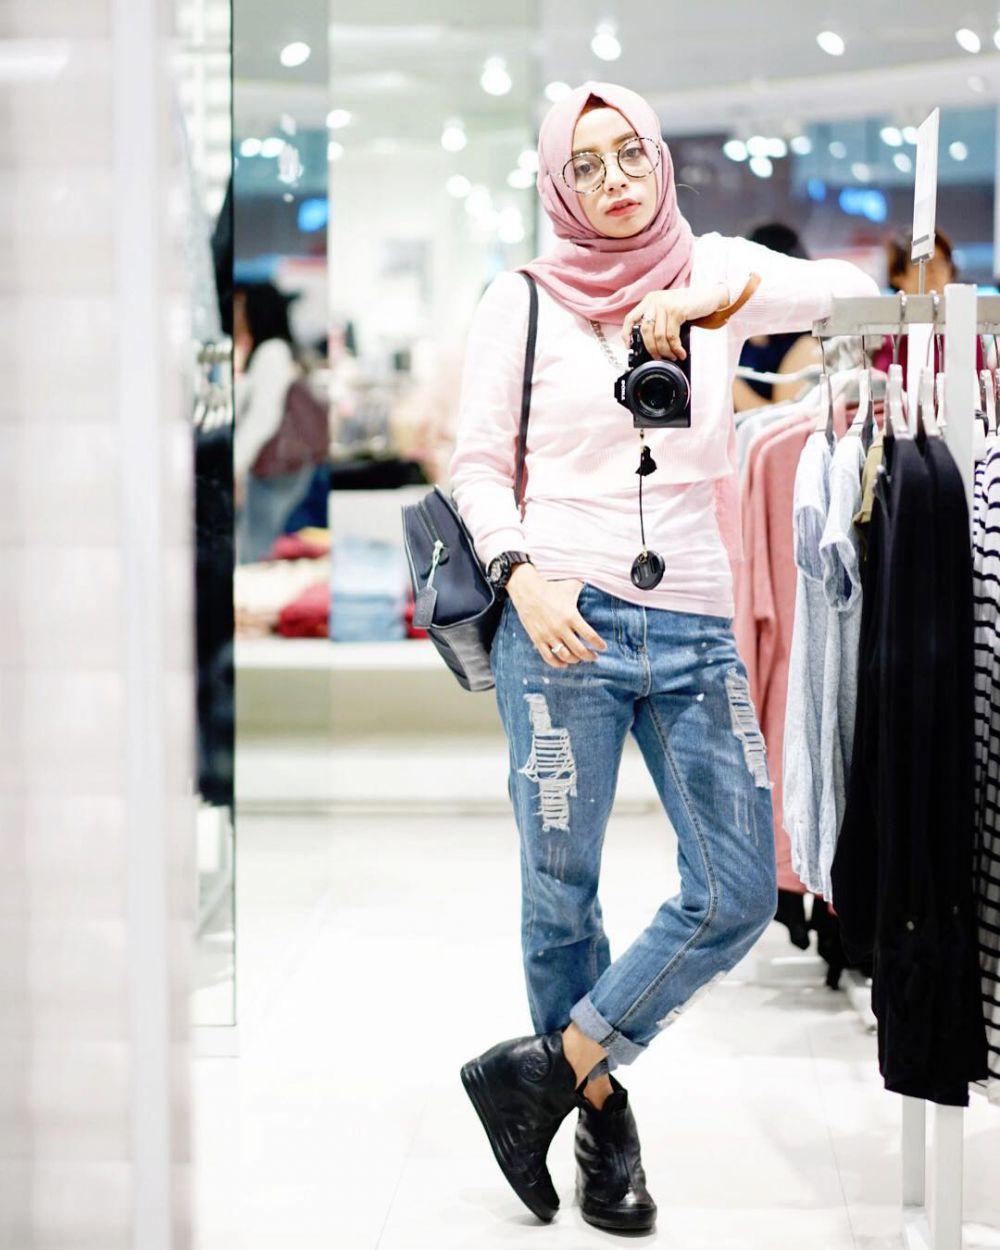 jeans hijab © 2016 brilio.net